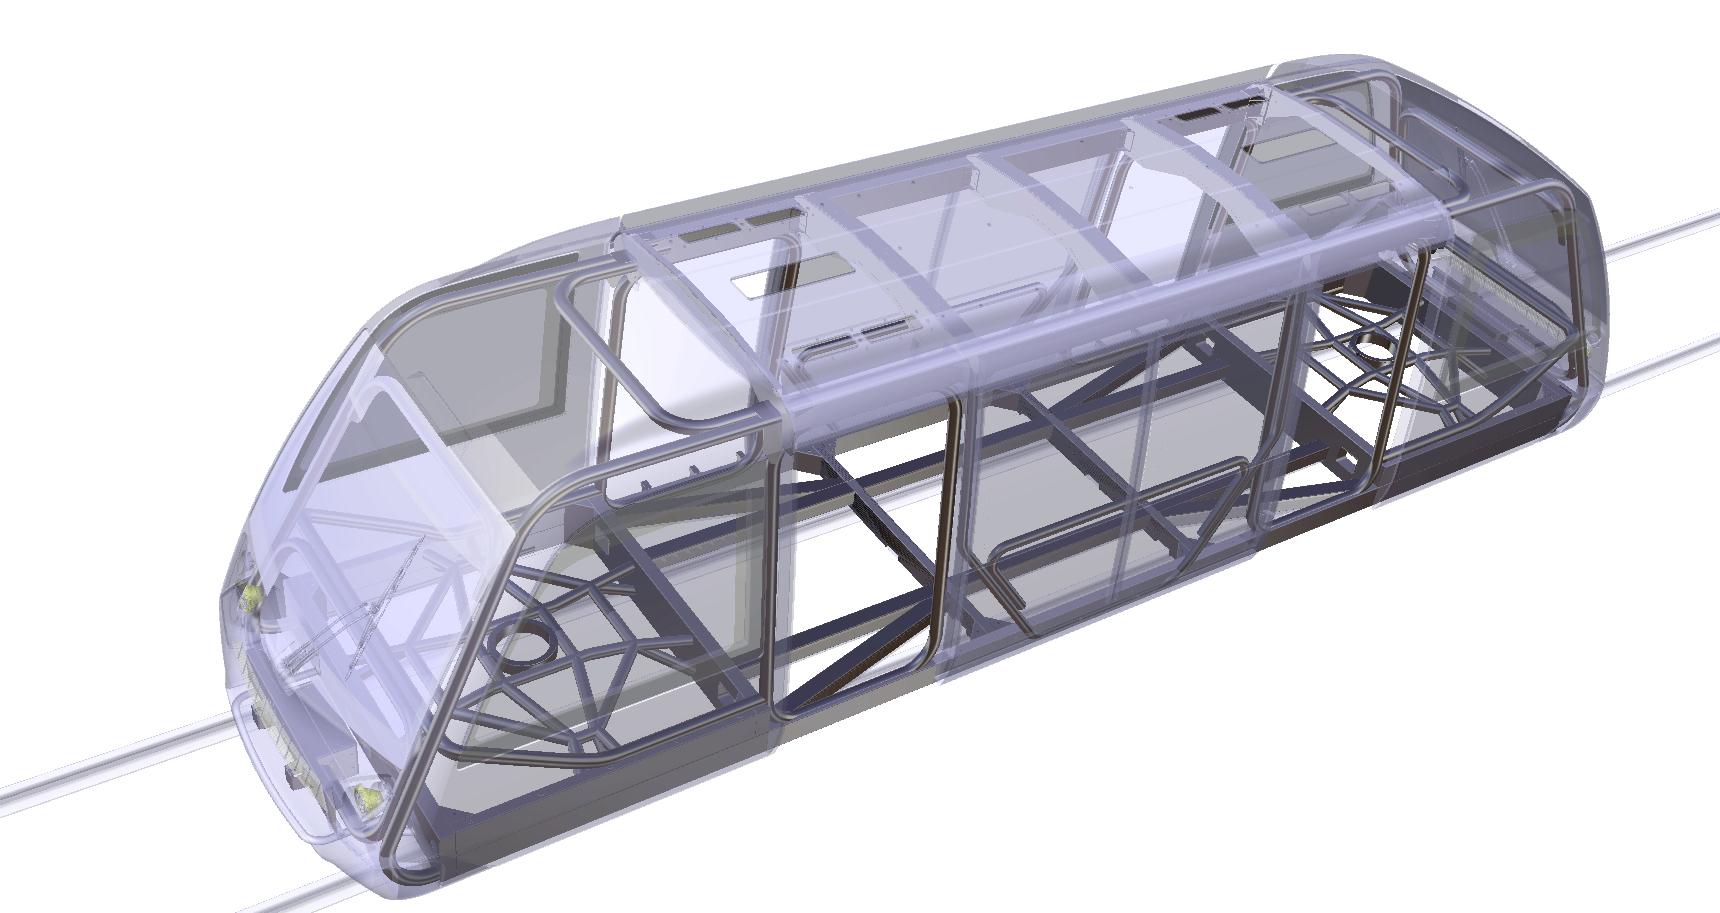 Newswise: Woven Light Rail Design wins Gold at JEC World 2020 Innovation Awards